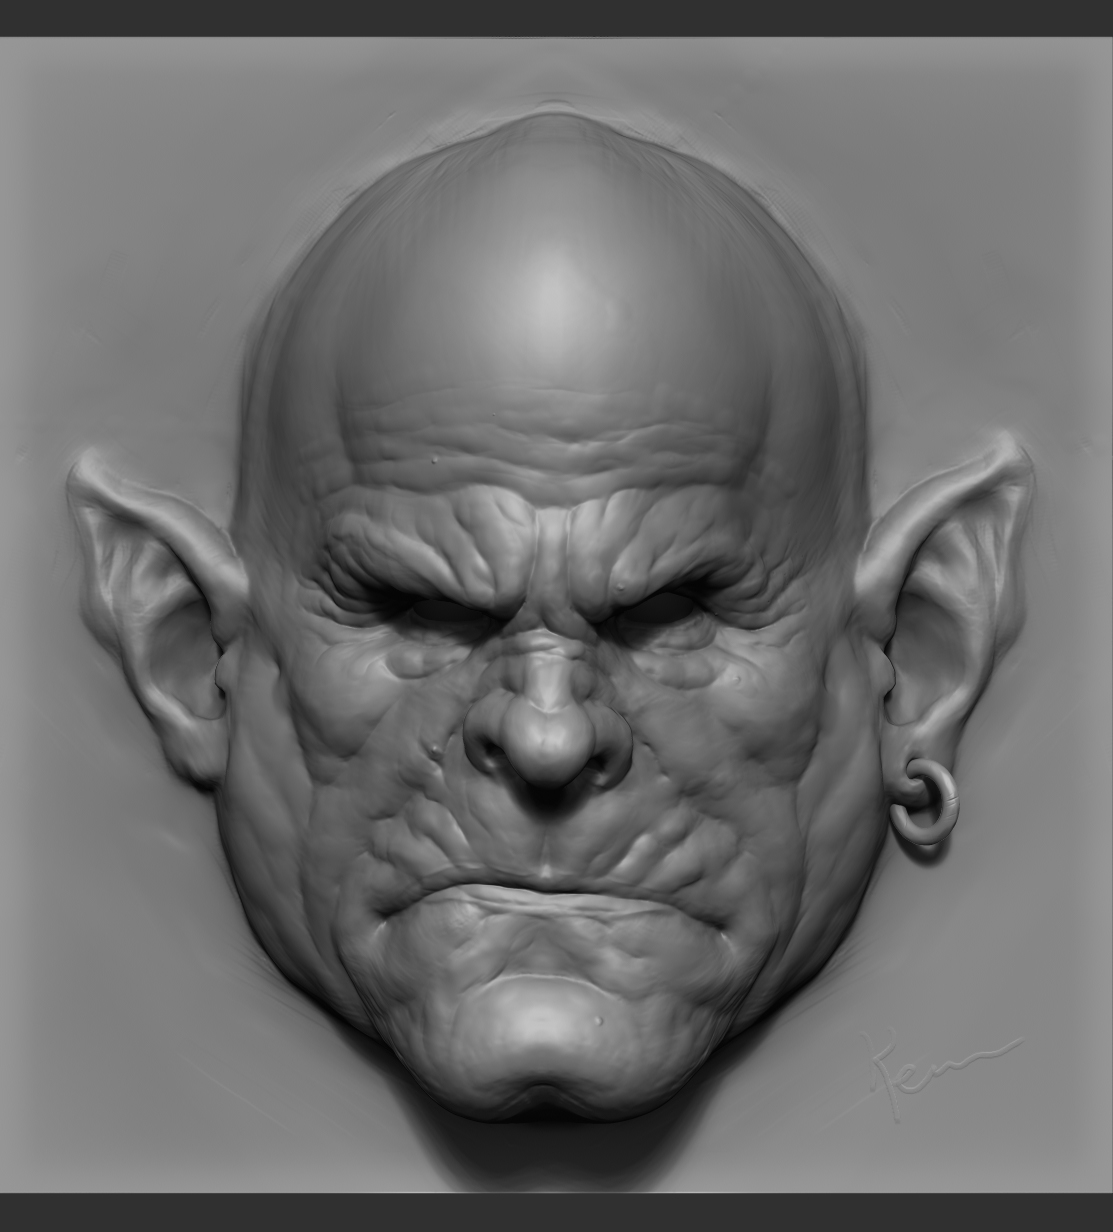 Kevinvfx head sculpture 1 3cc84999 epps